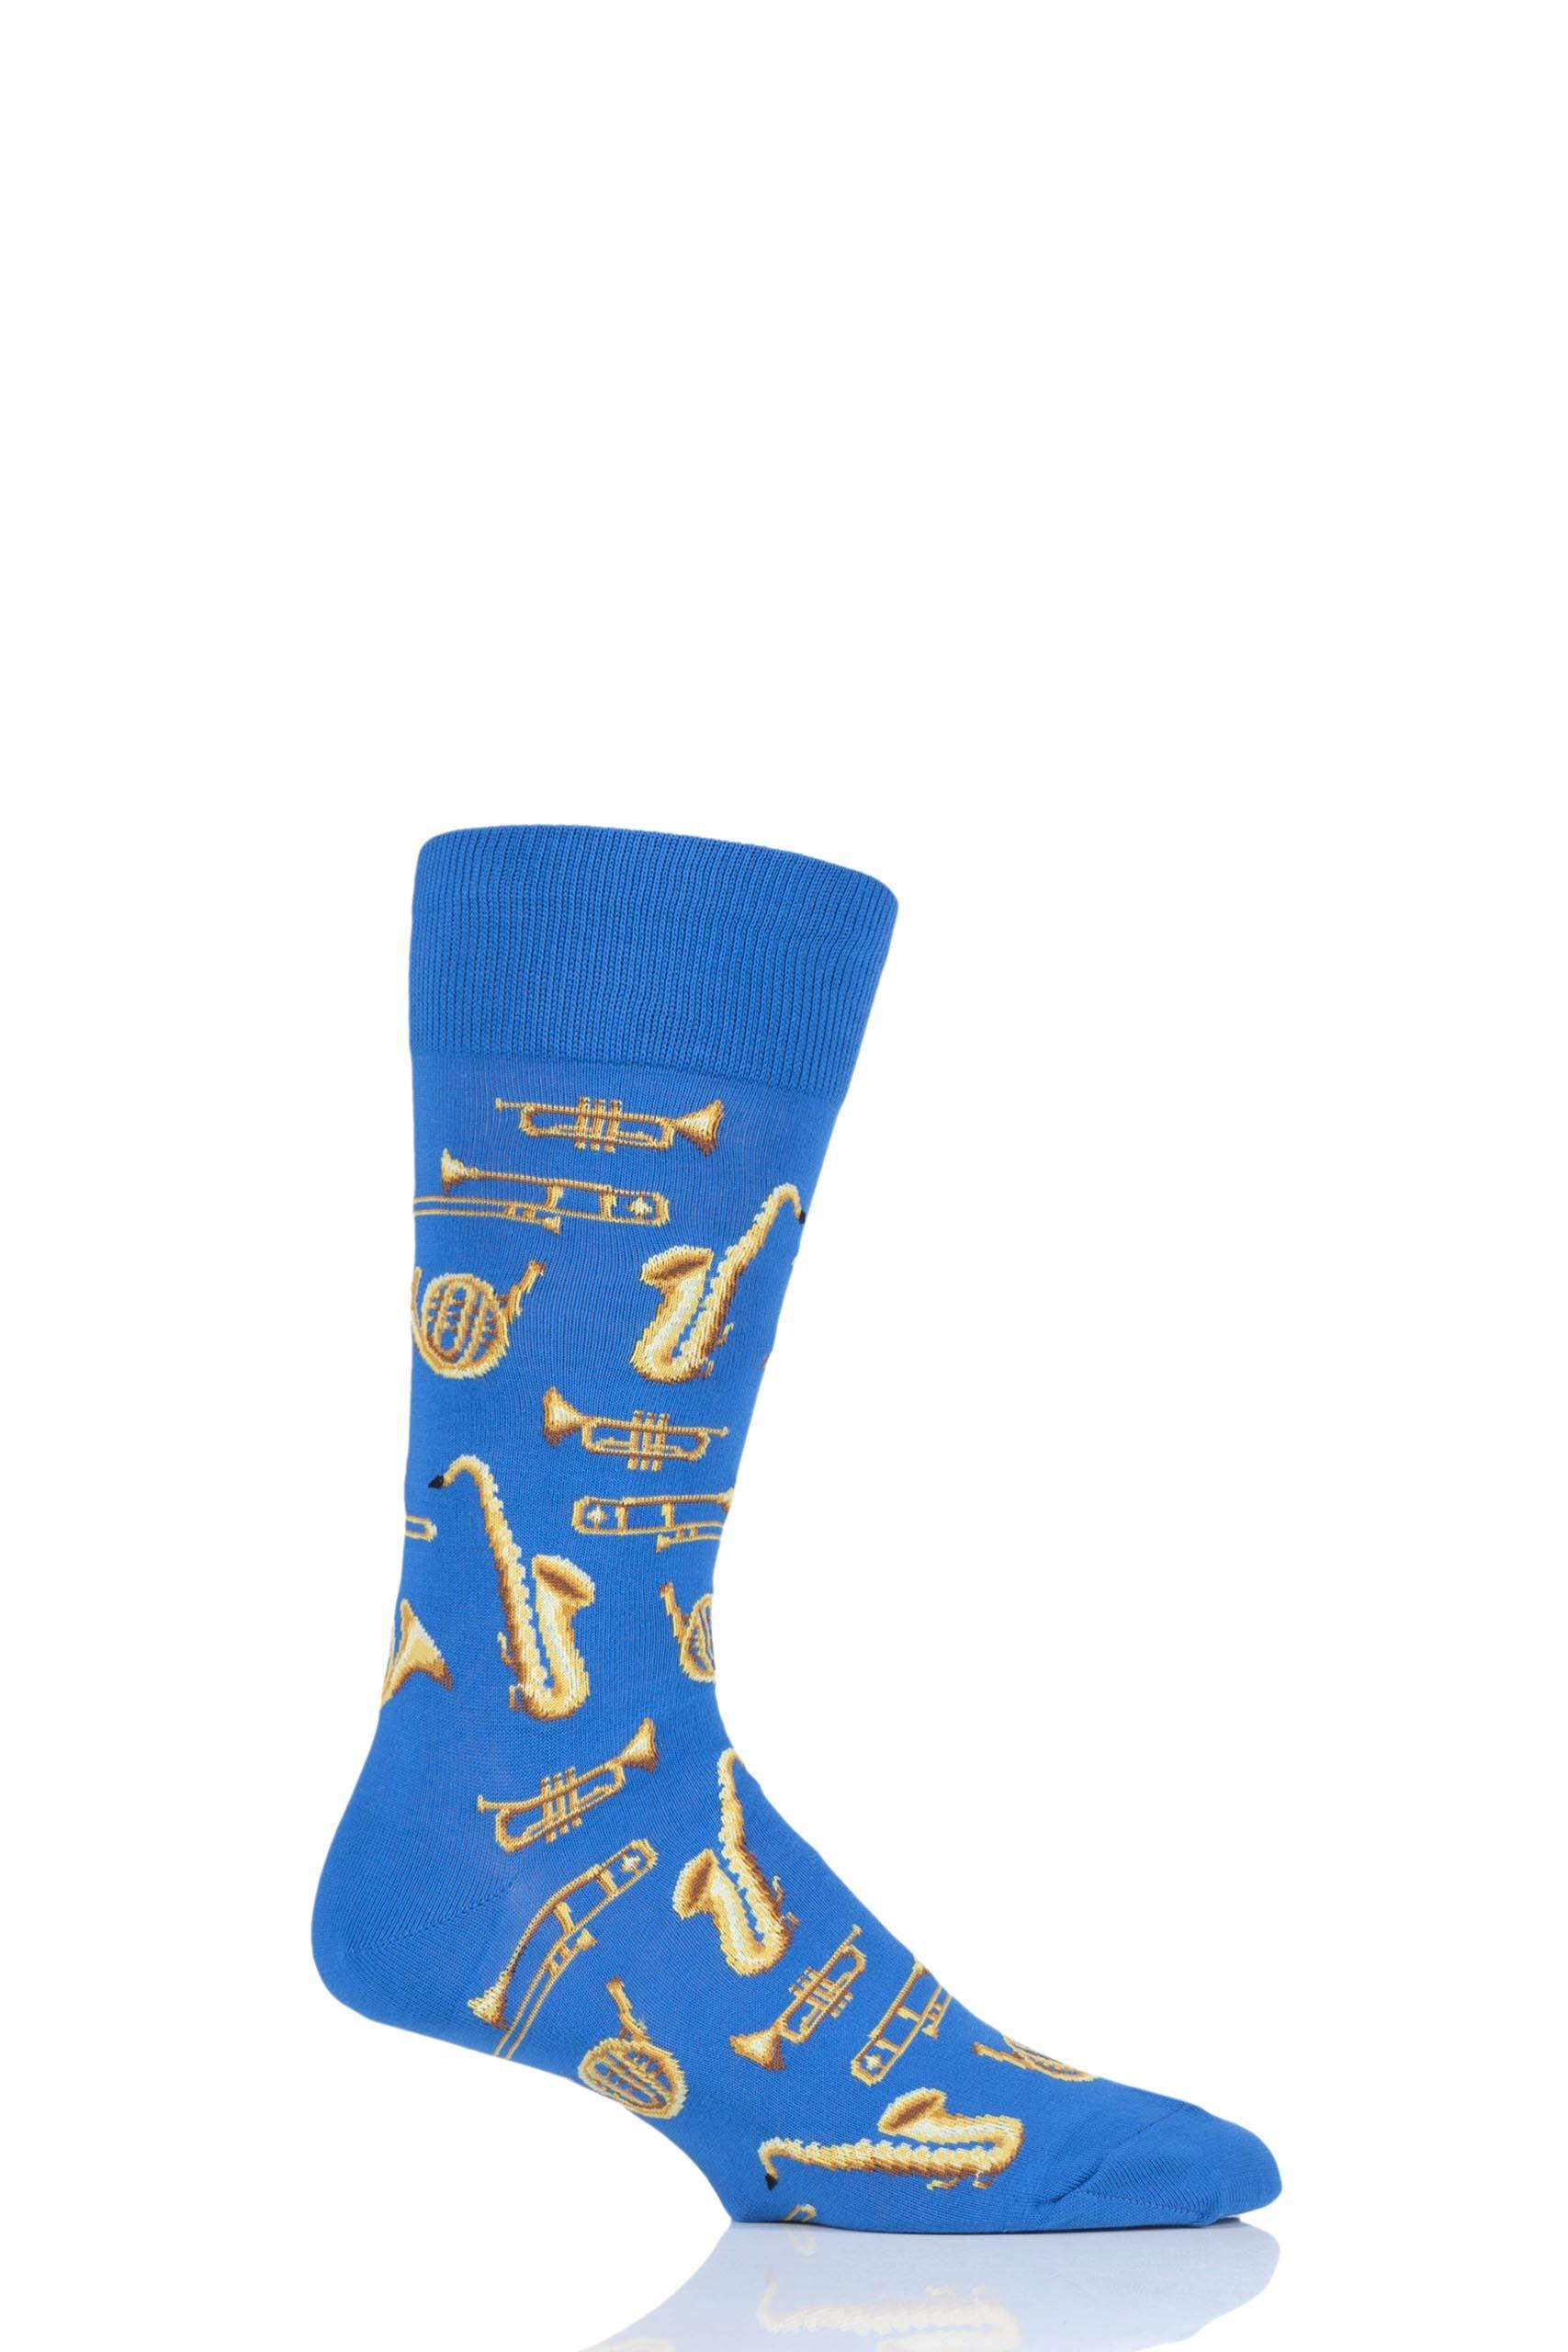 Image of 1 Pair Blue HotSox All Over Brass Instruments Cotton Socks Men's 8-12 Mens - Hot Sox